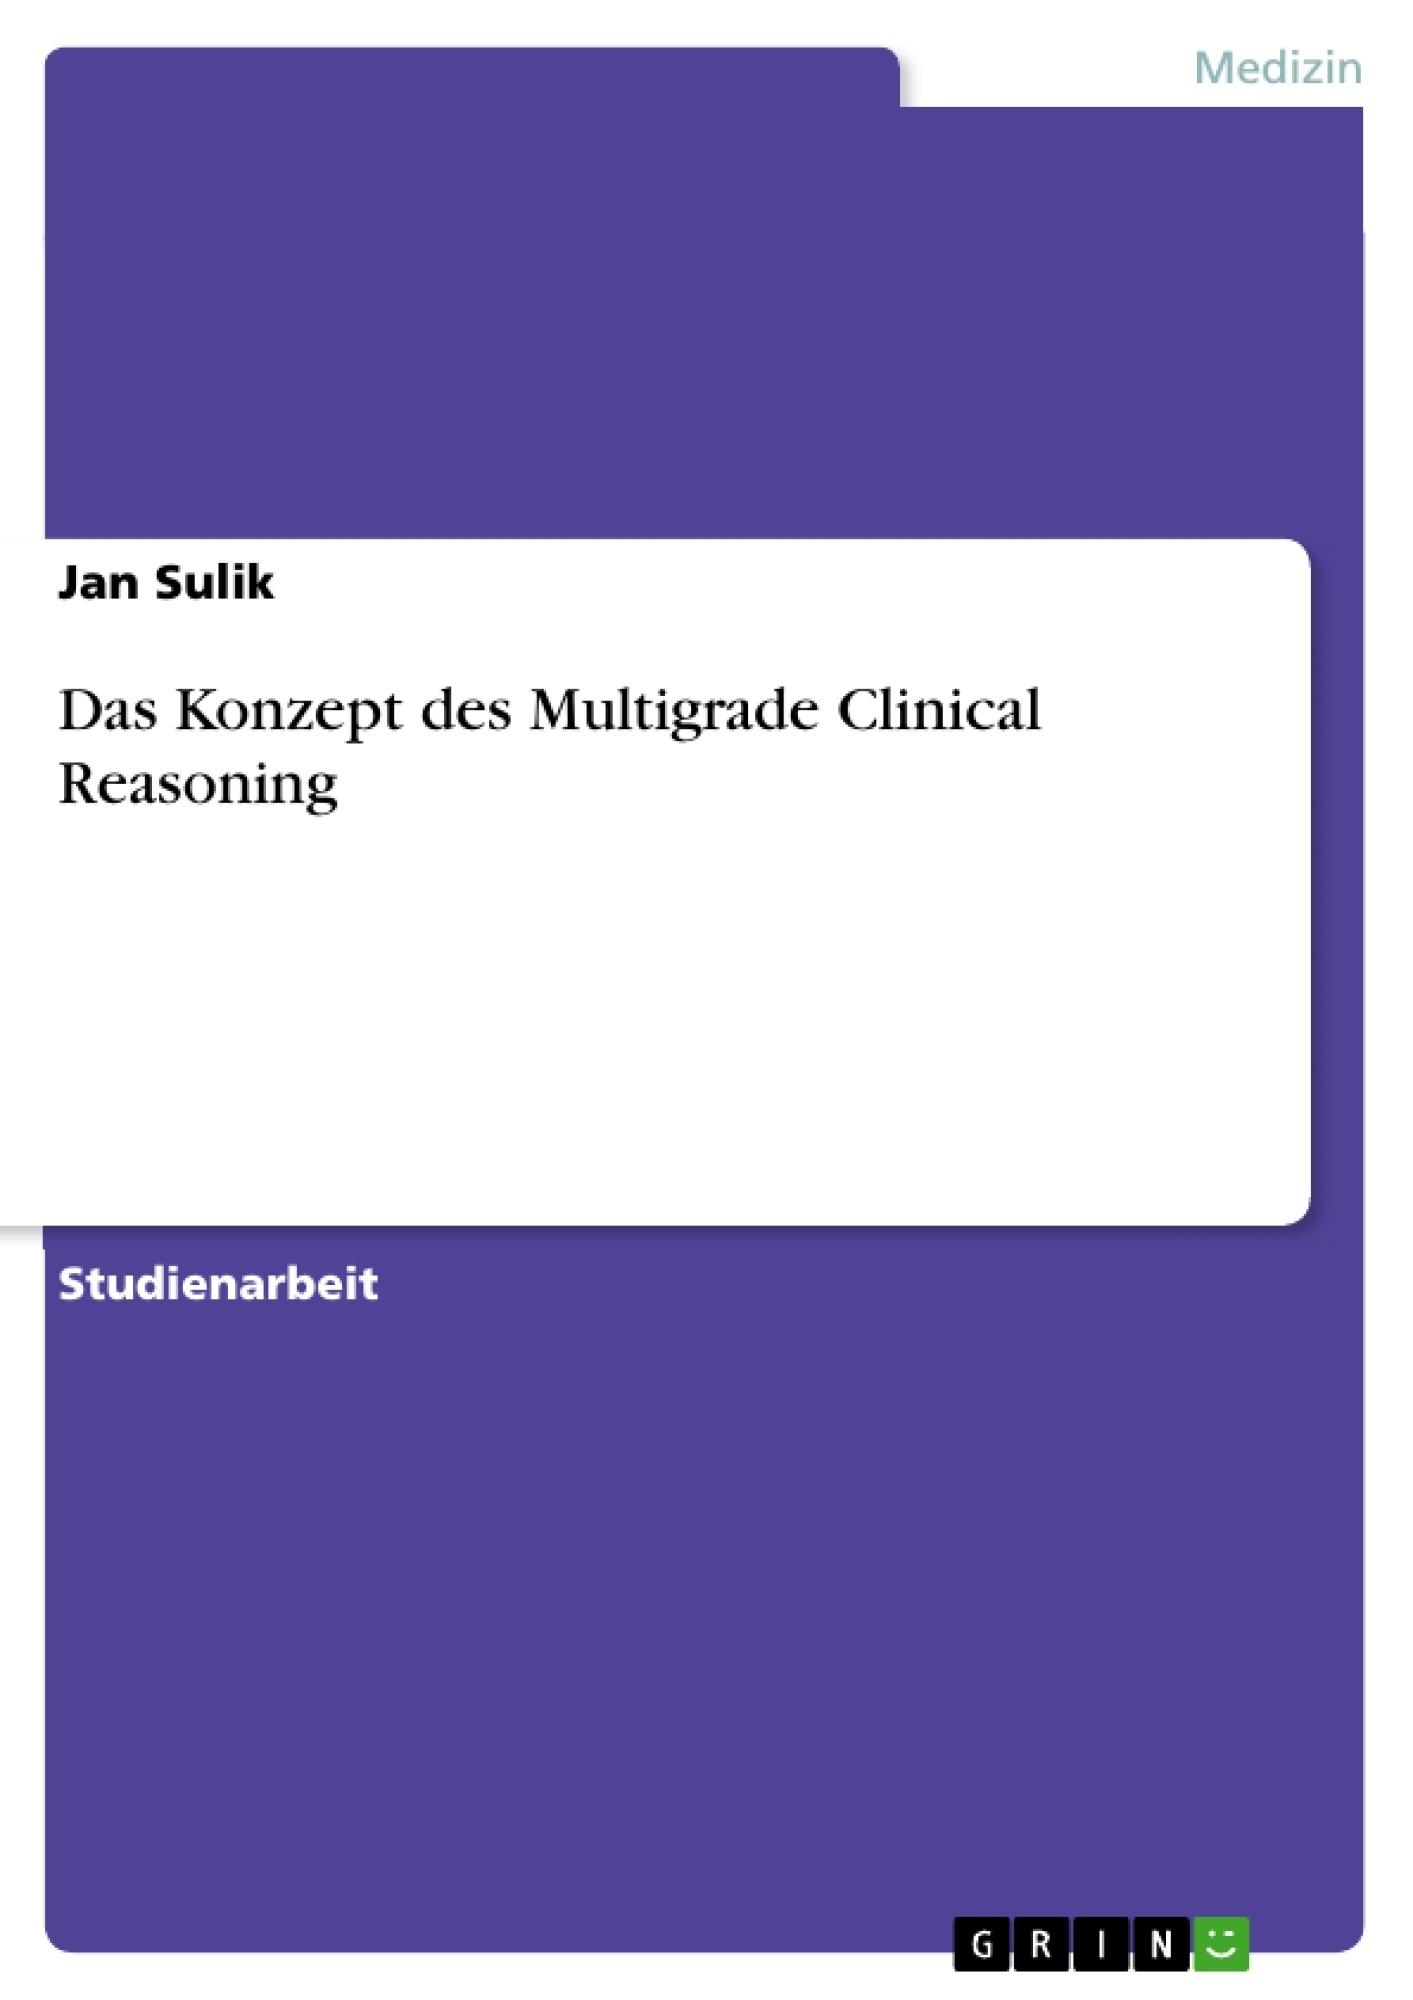 Titel: Das Konzept des Multigrade Clinical Reasoning